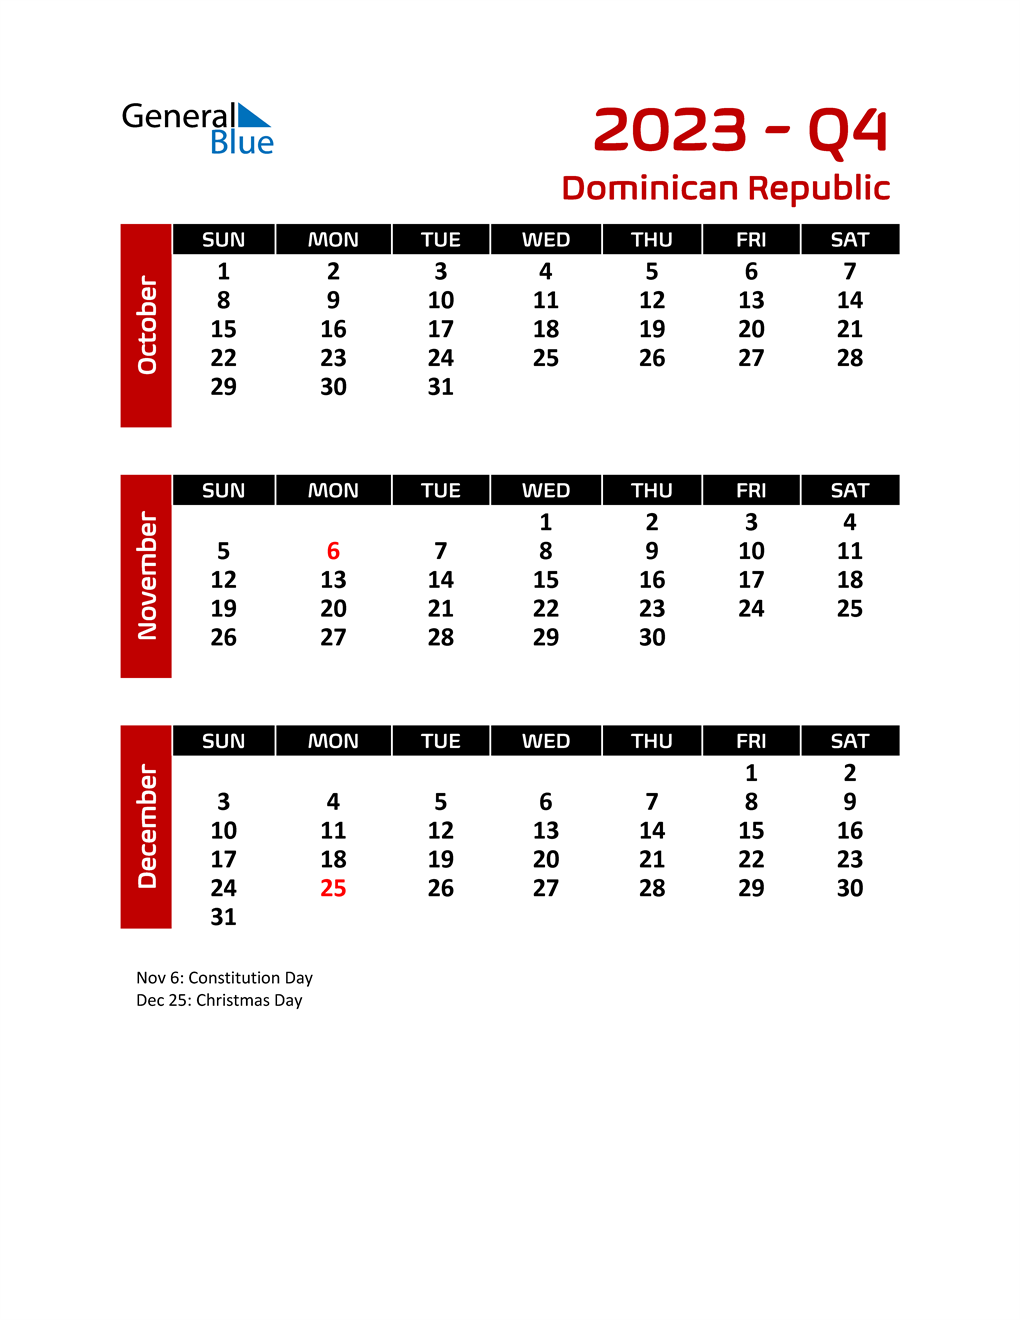 Q4 2023 Calendar with Holidays